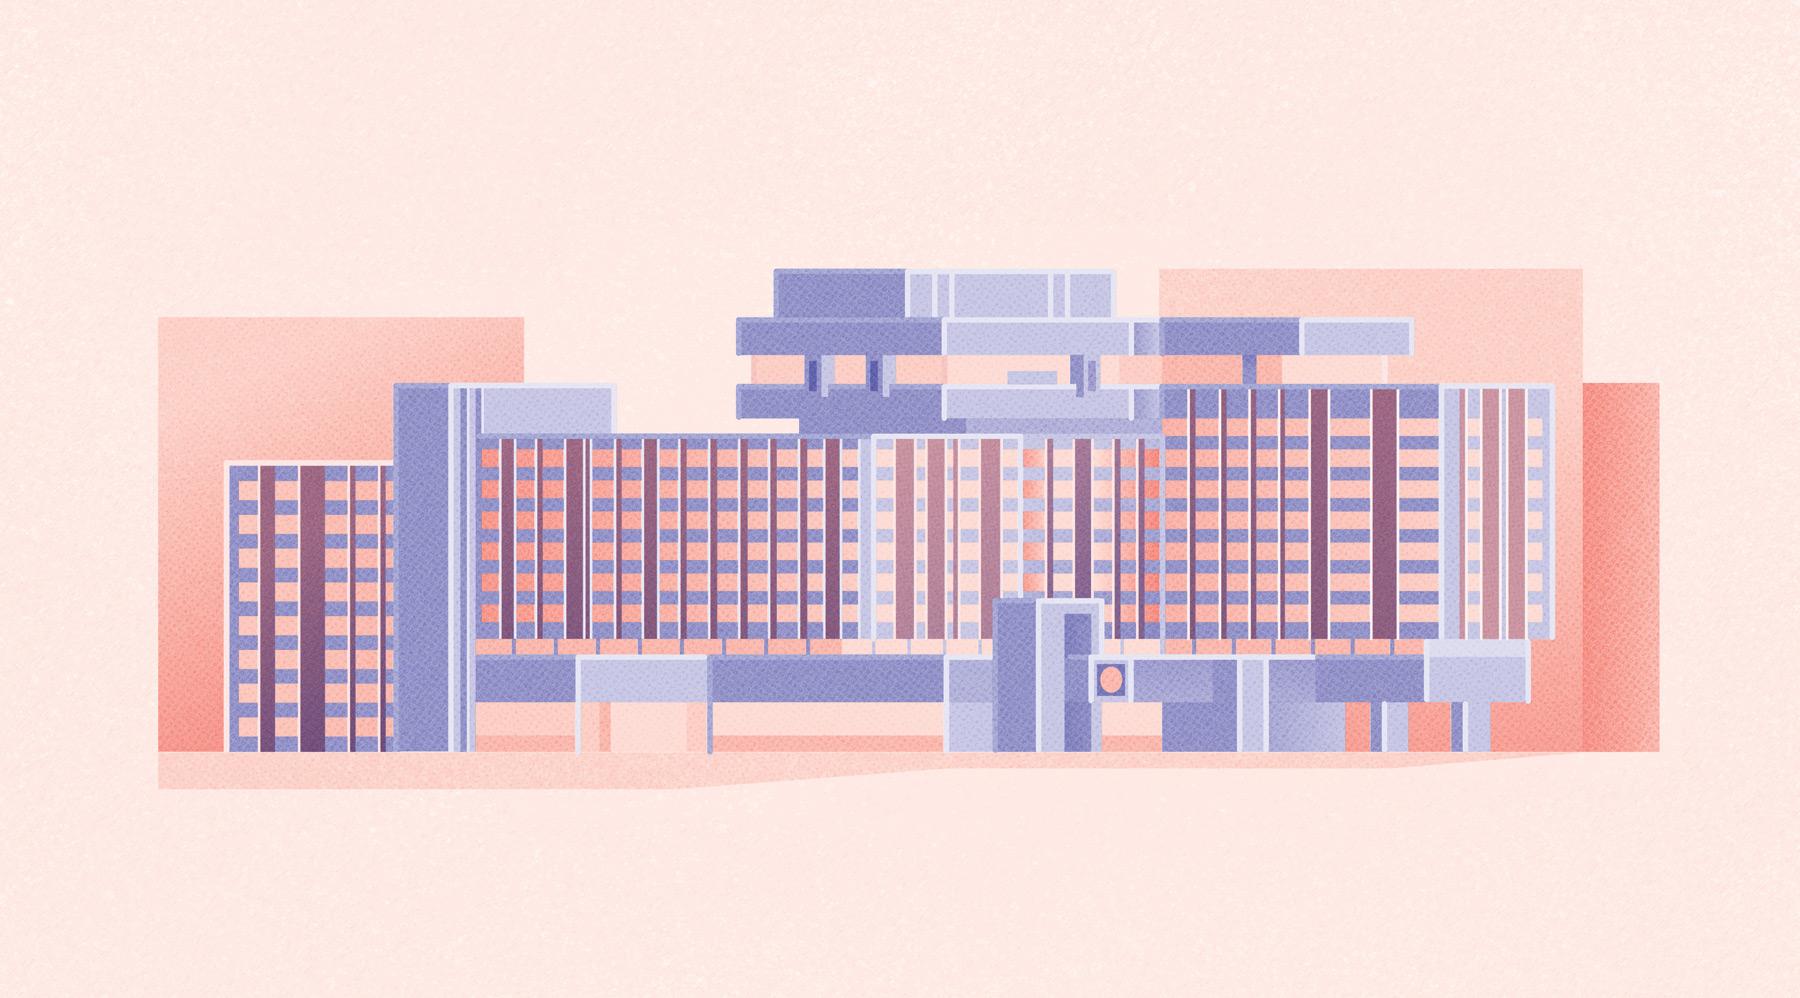 wp-hotel-interkontinental